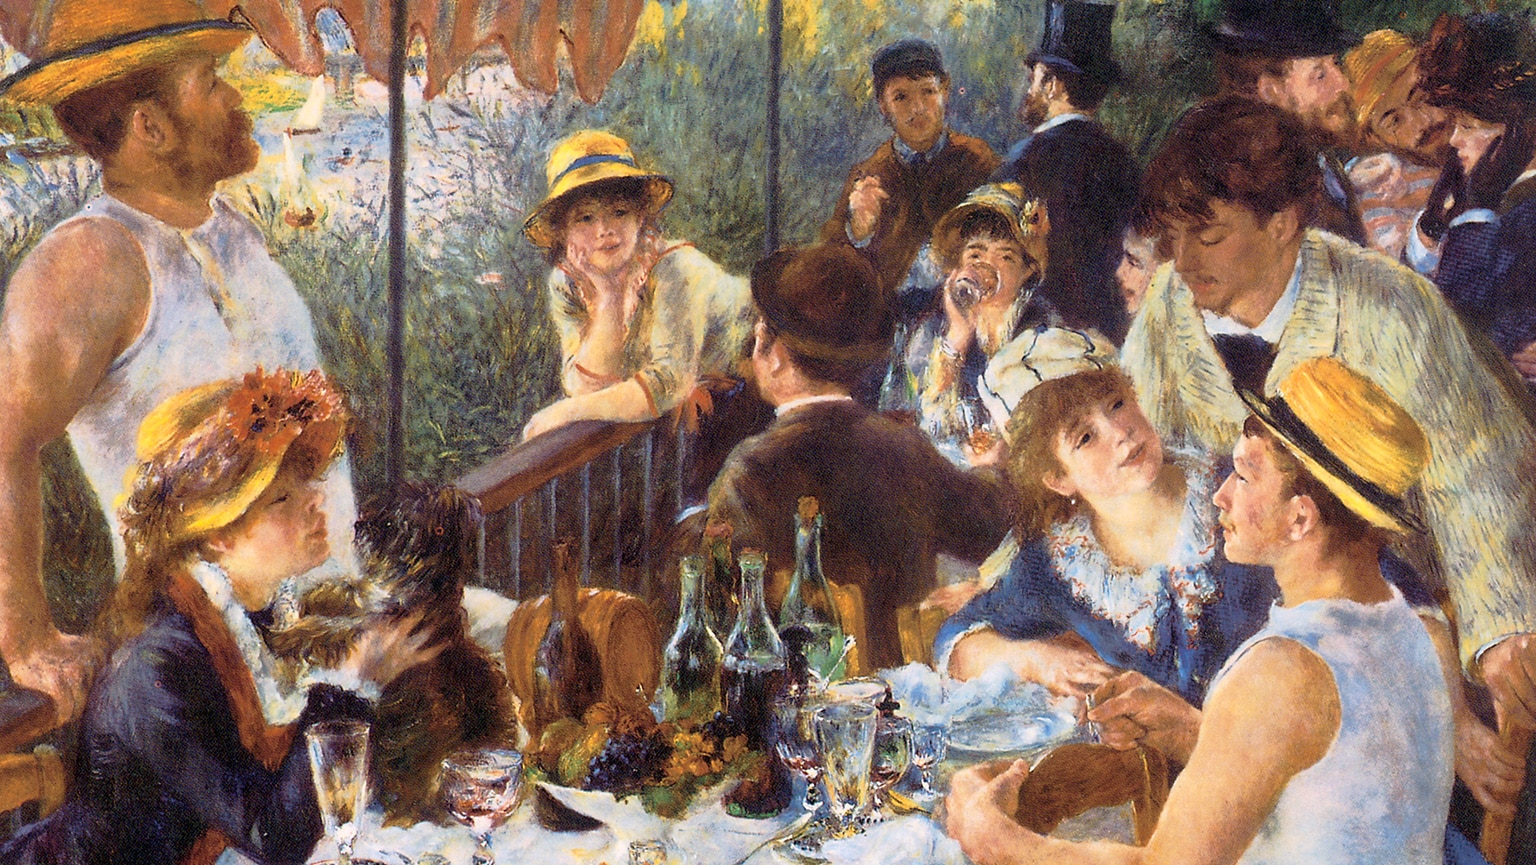 Renoir, Pissarro, and Cézanne